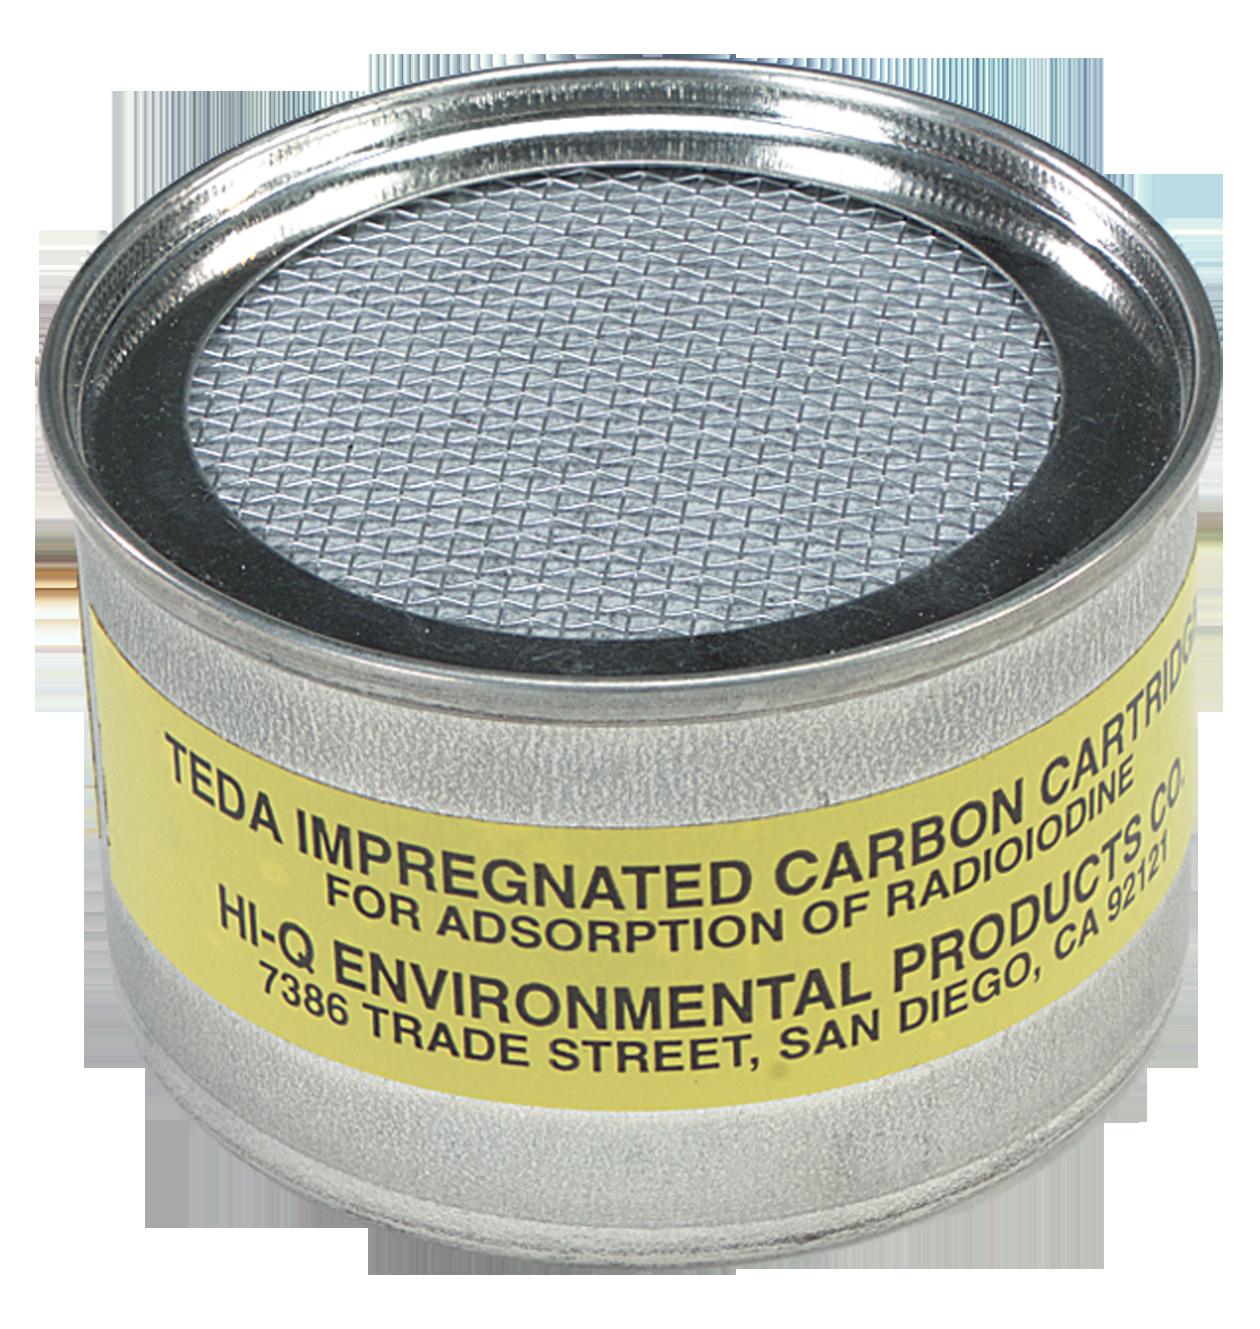 TEDA Impregnated Carbon Cartridges - HI-Q Environmental Products